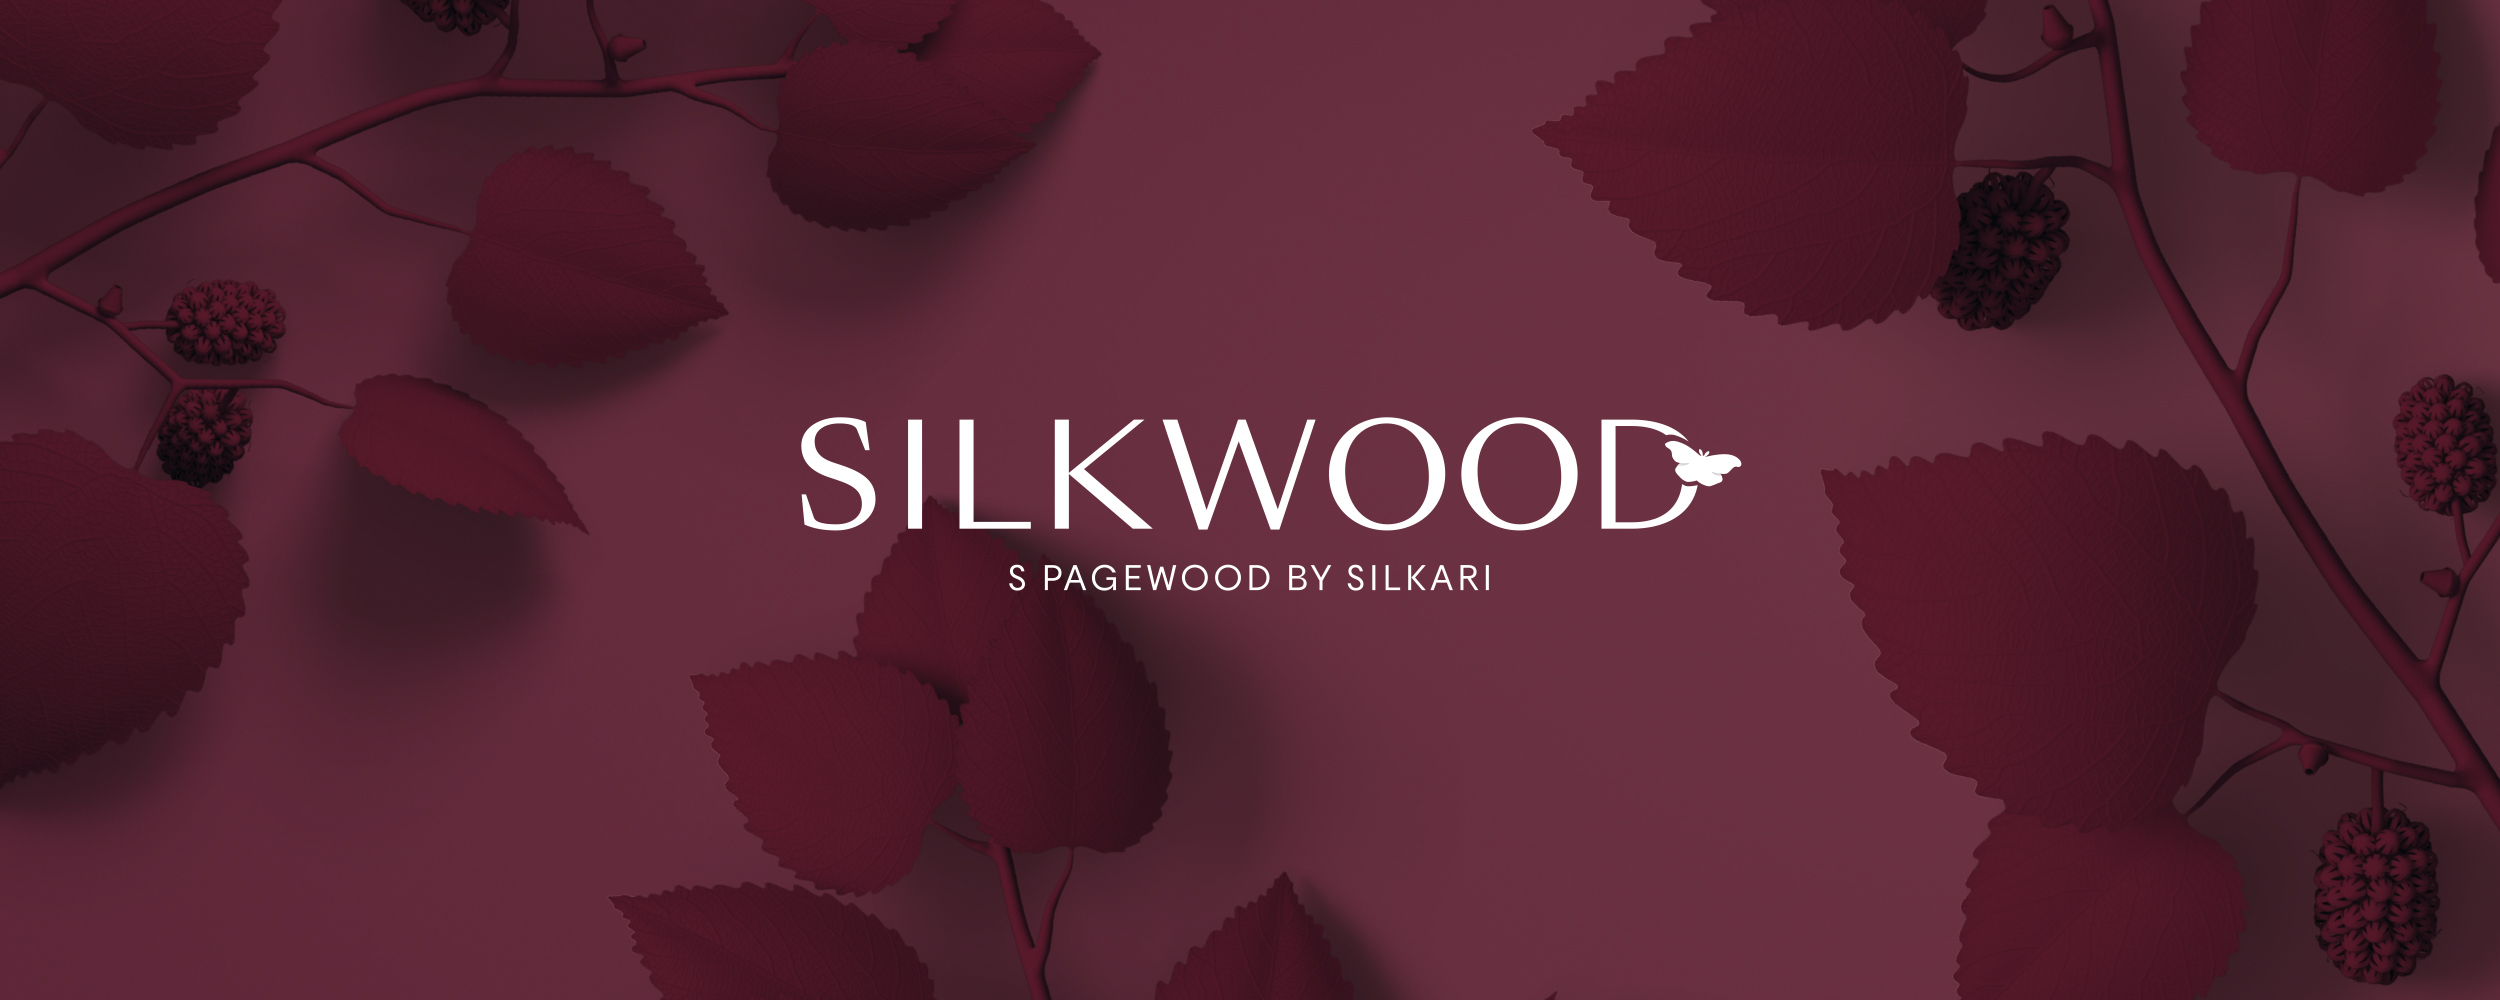 TNG-silkwood.jpg